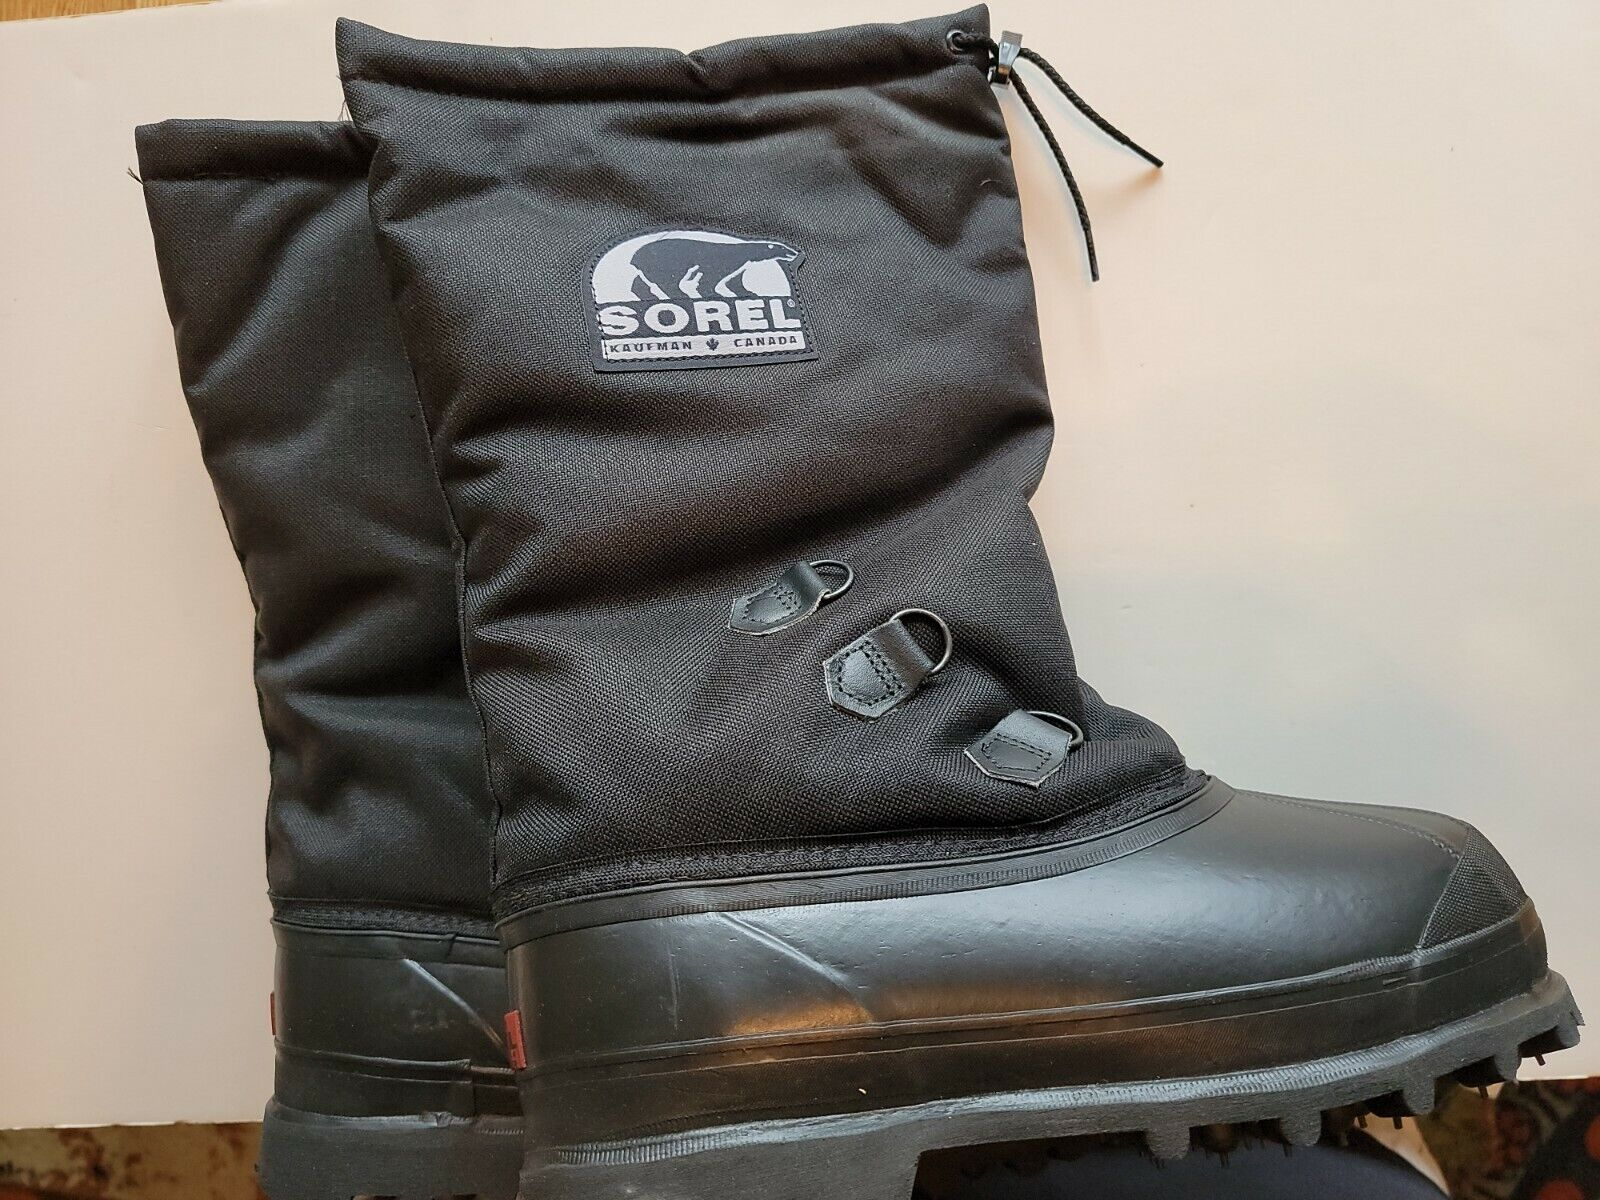 Brand New Sorel Glacier III Boots Men's Size 10 Black